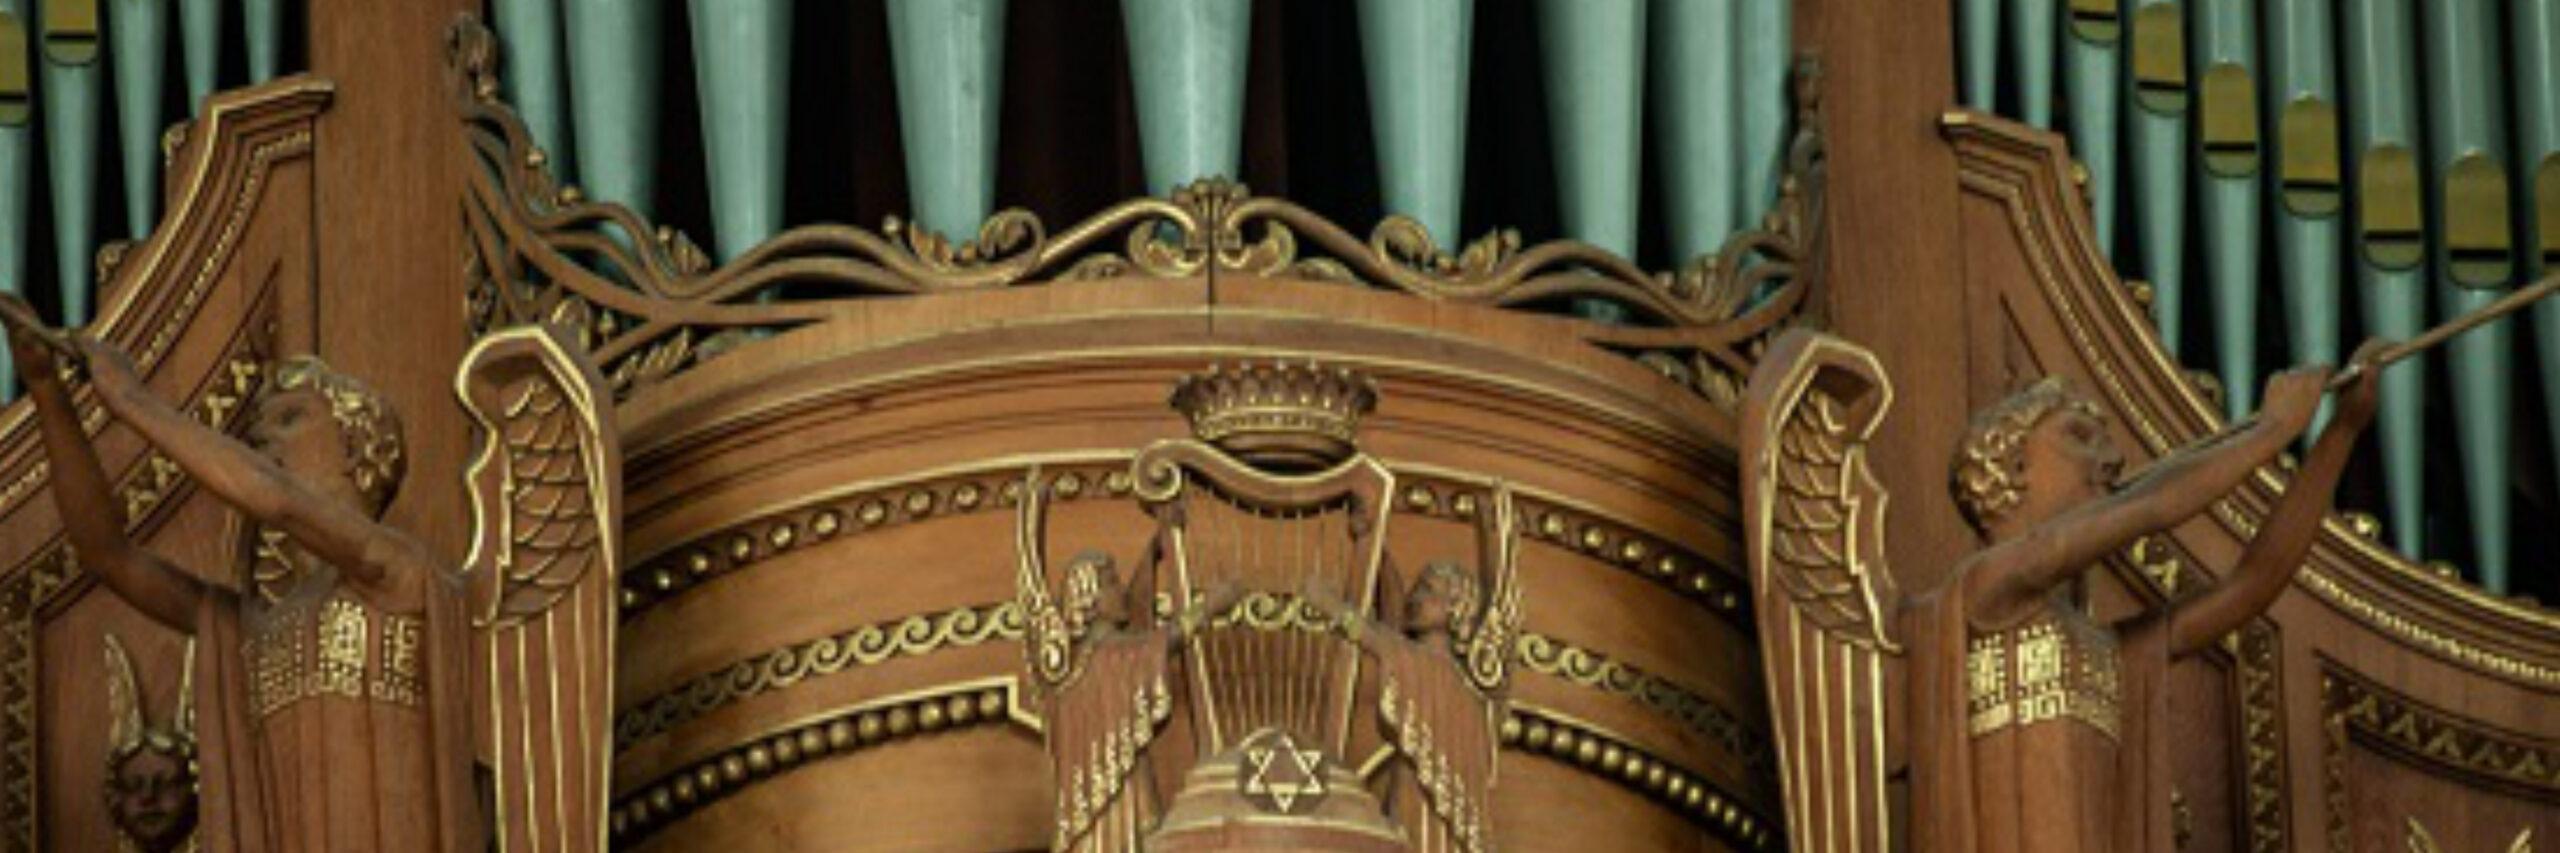 Zomeravond-orgelconcerten  van juli tot september